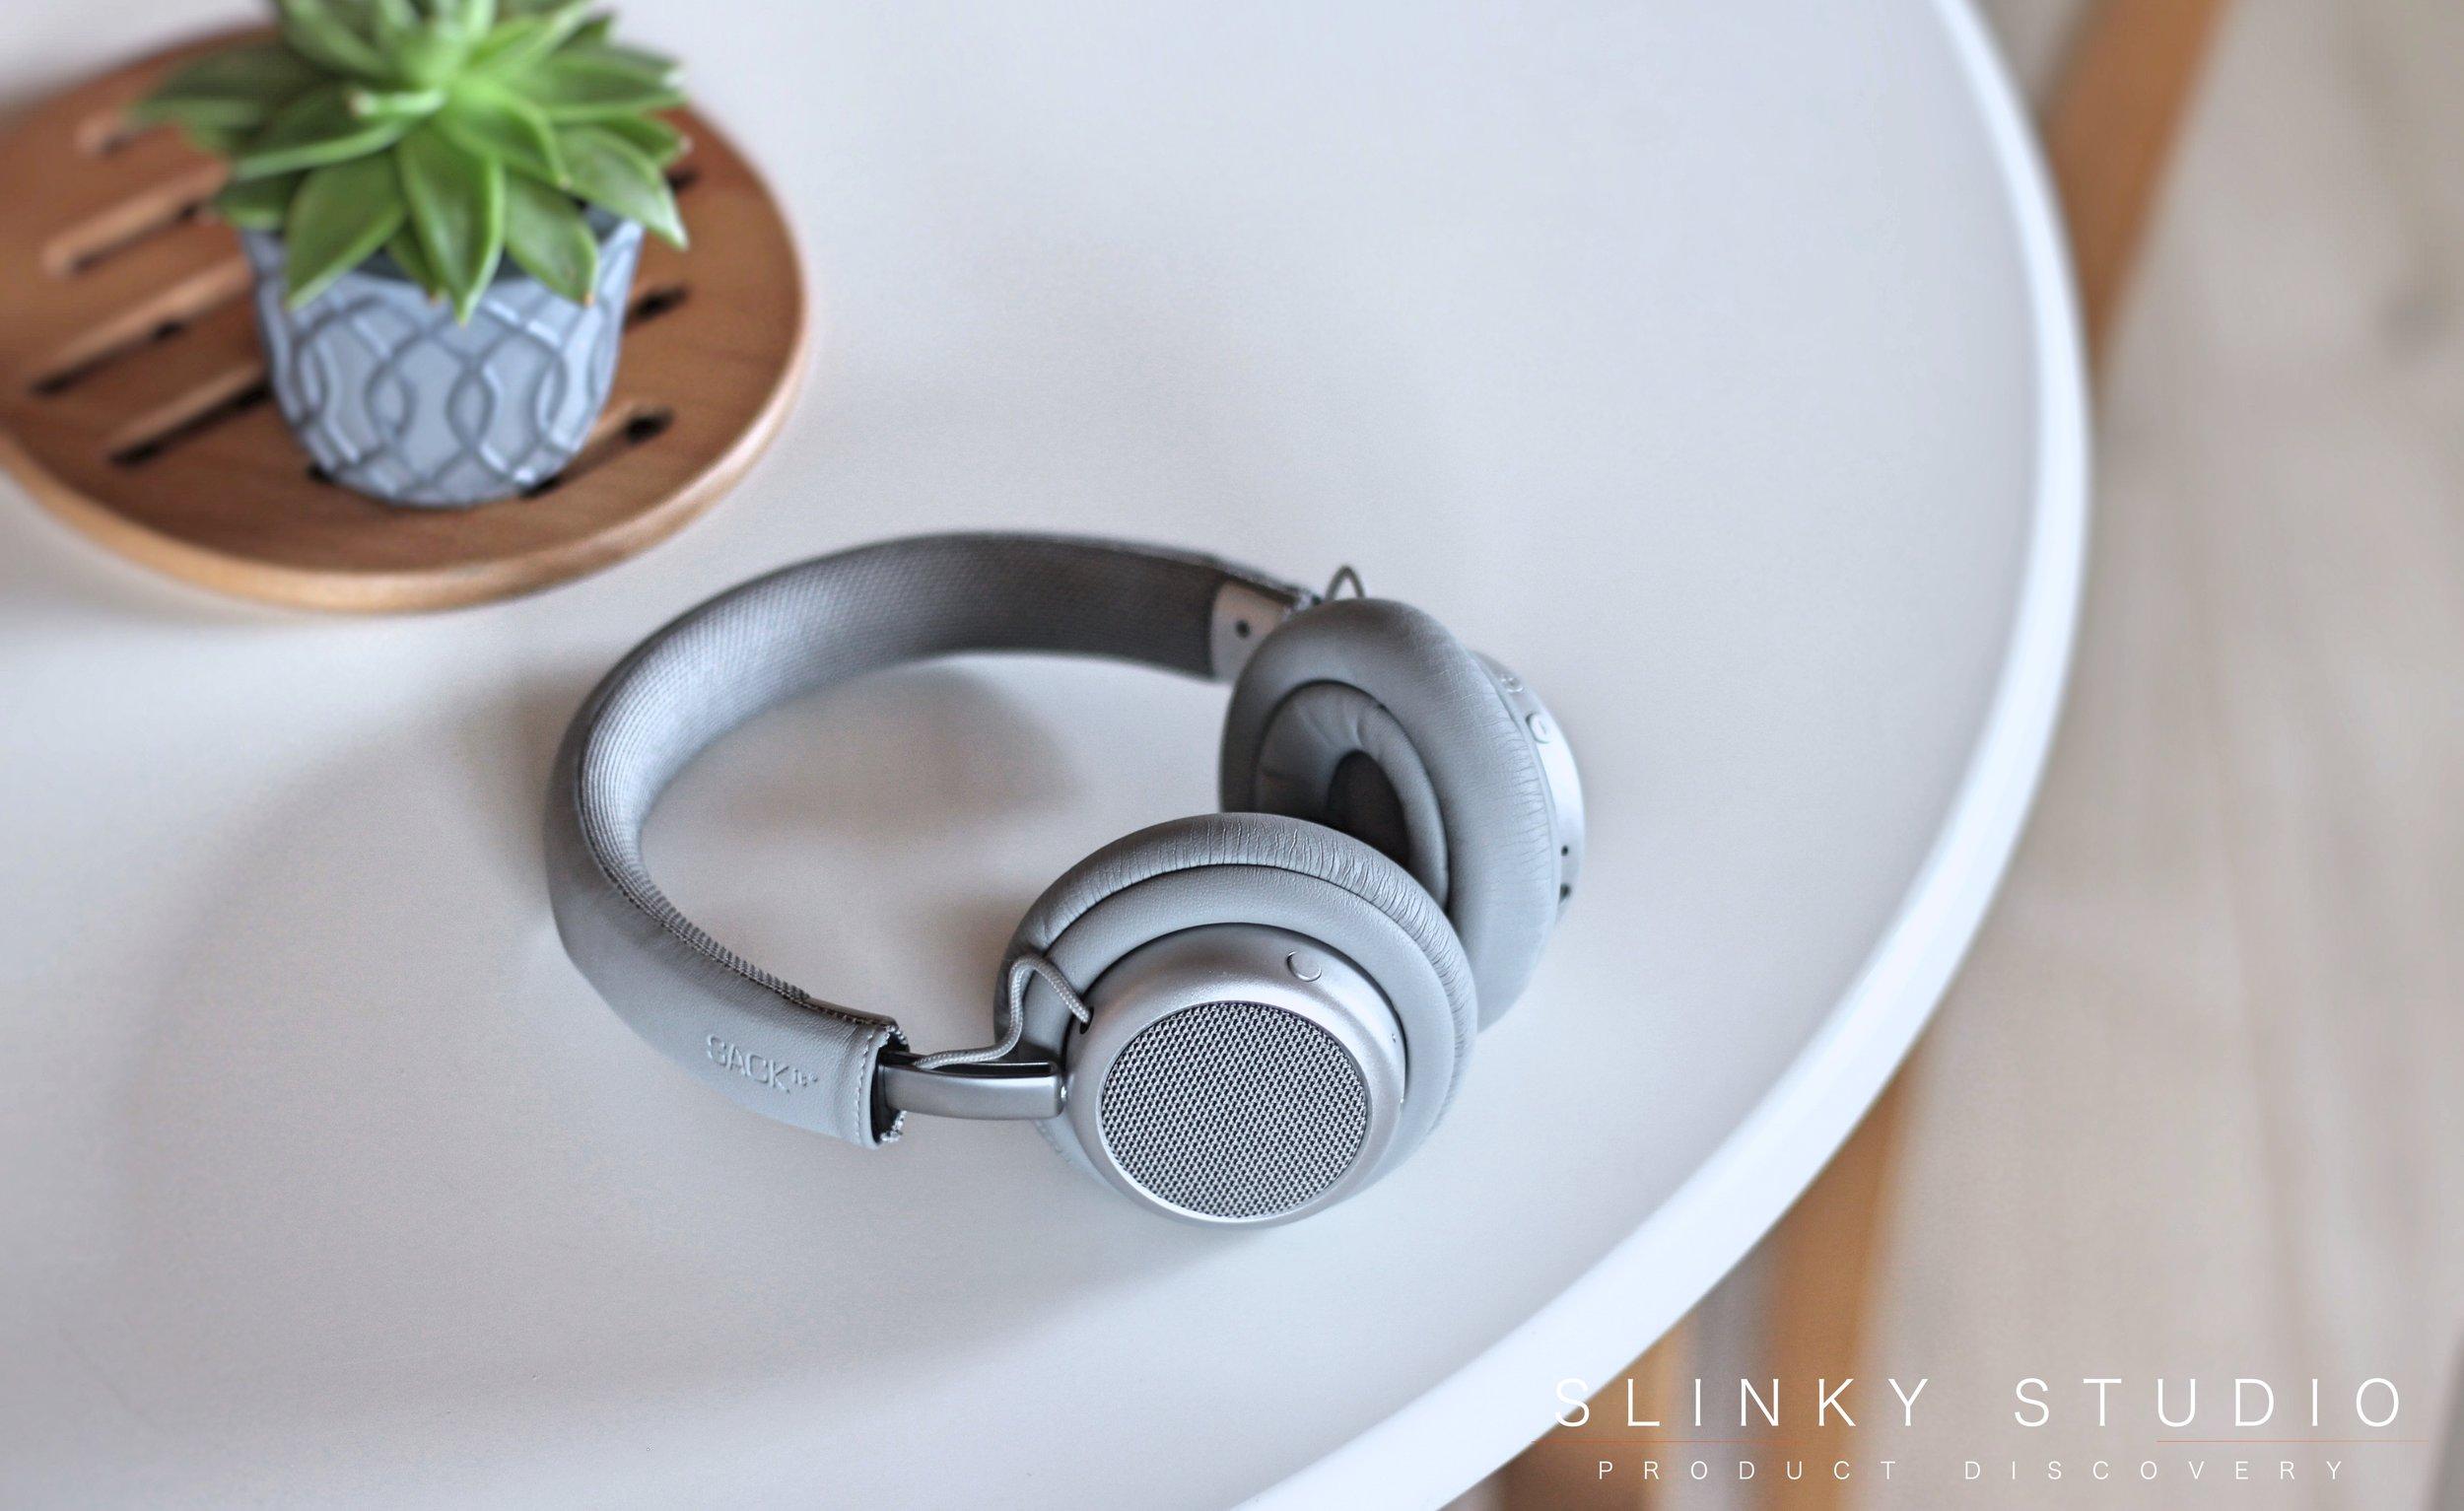 SACKit TOUCHit Headphones Silver.jpg